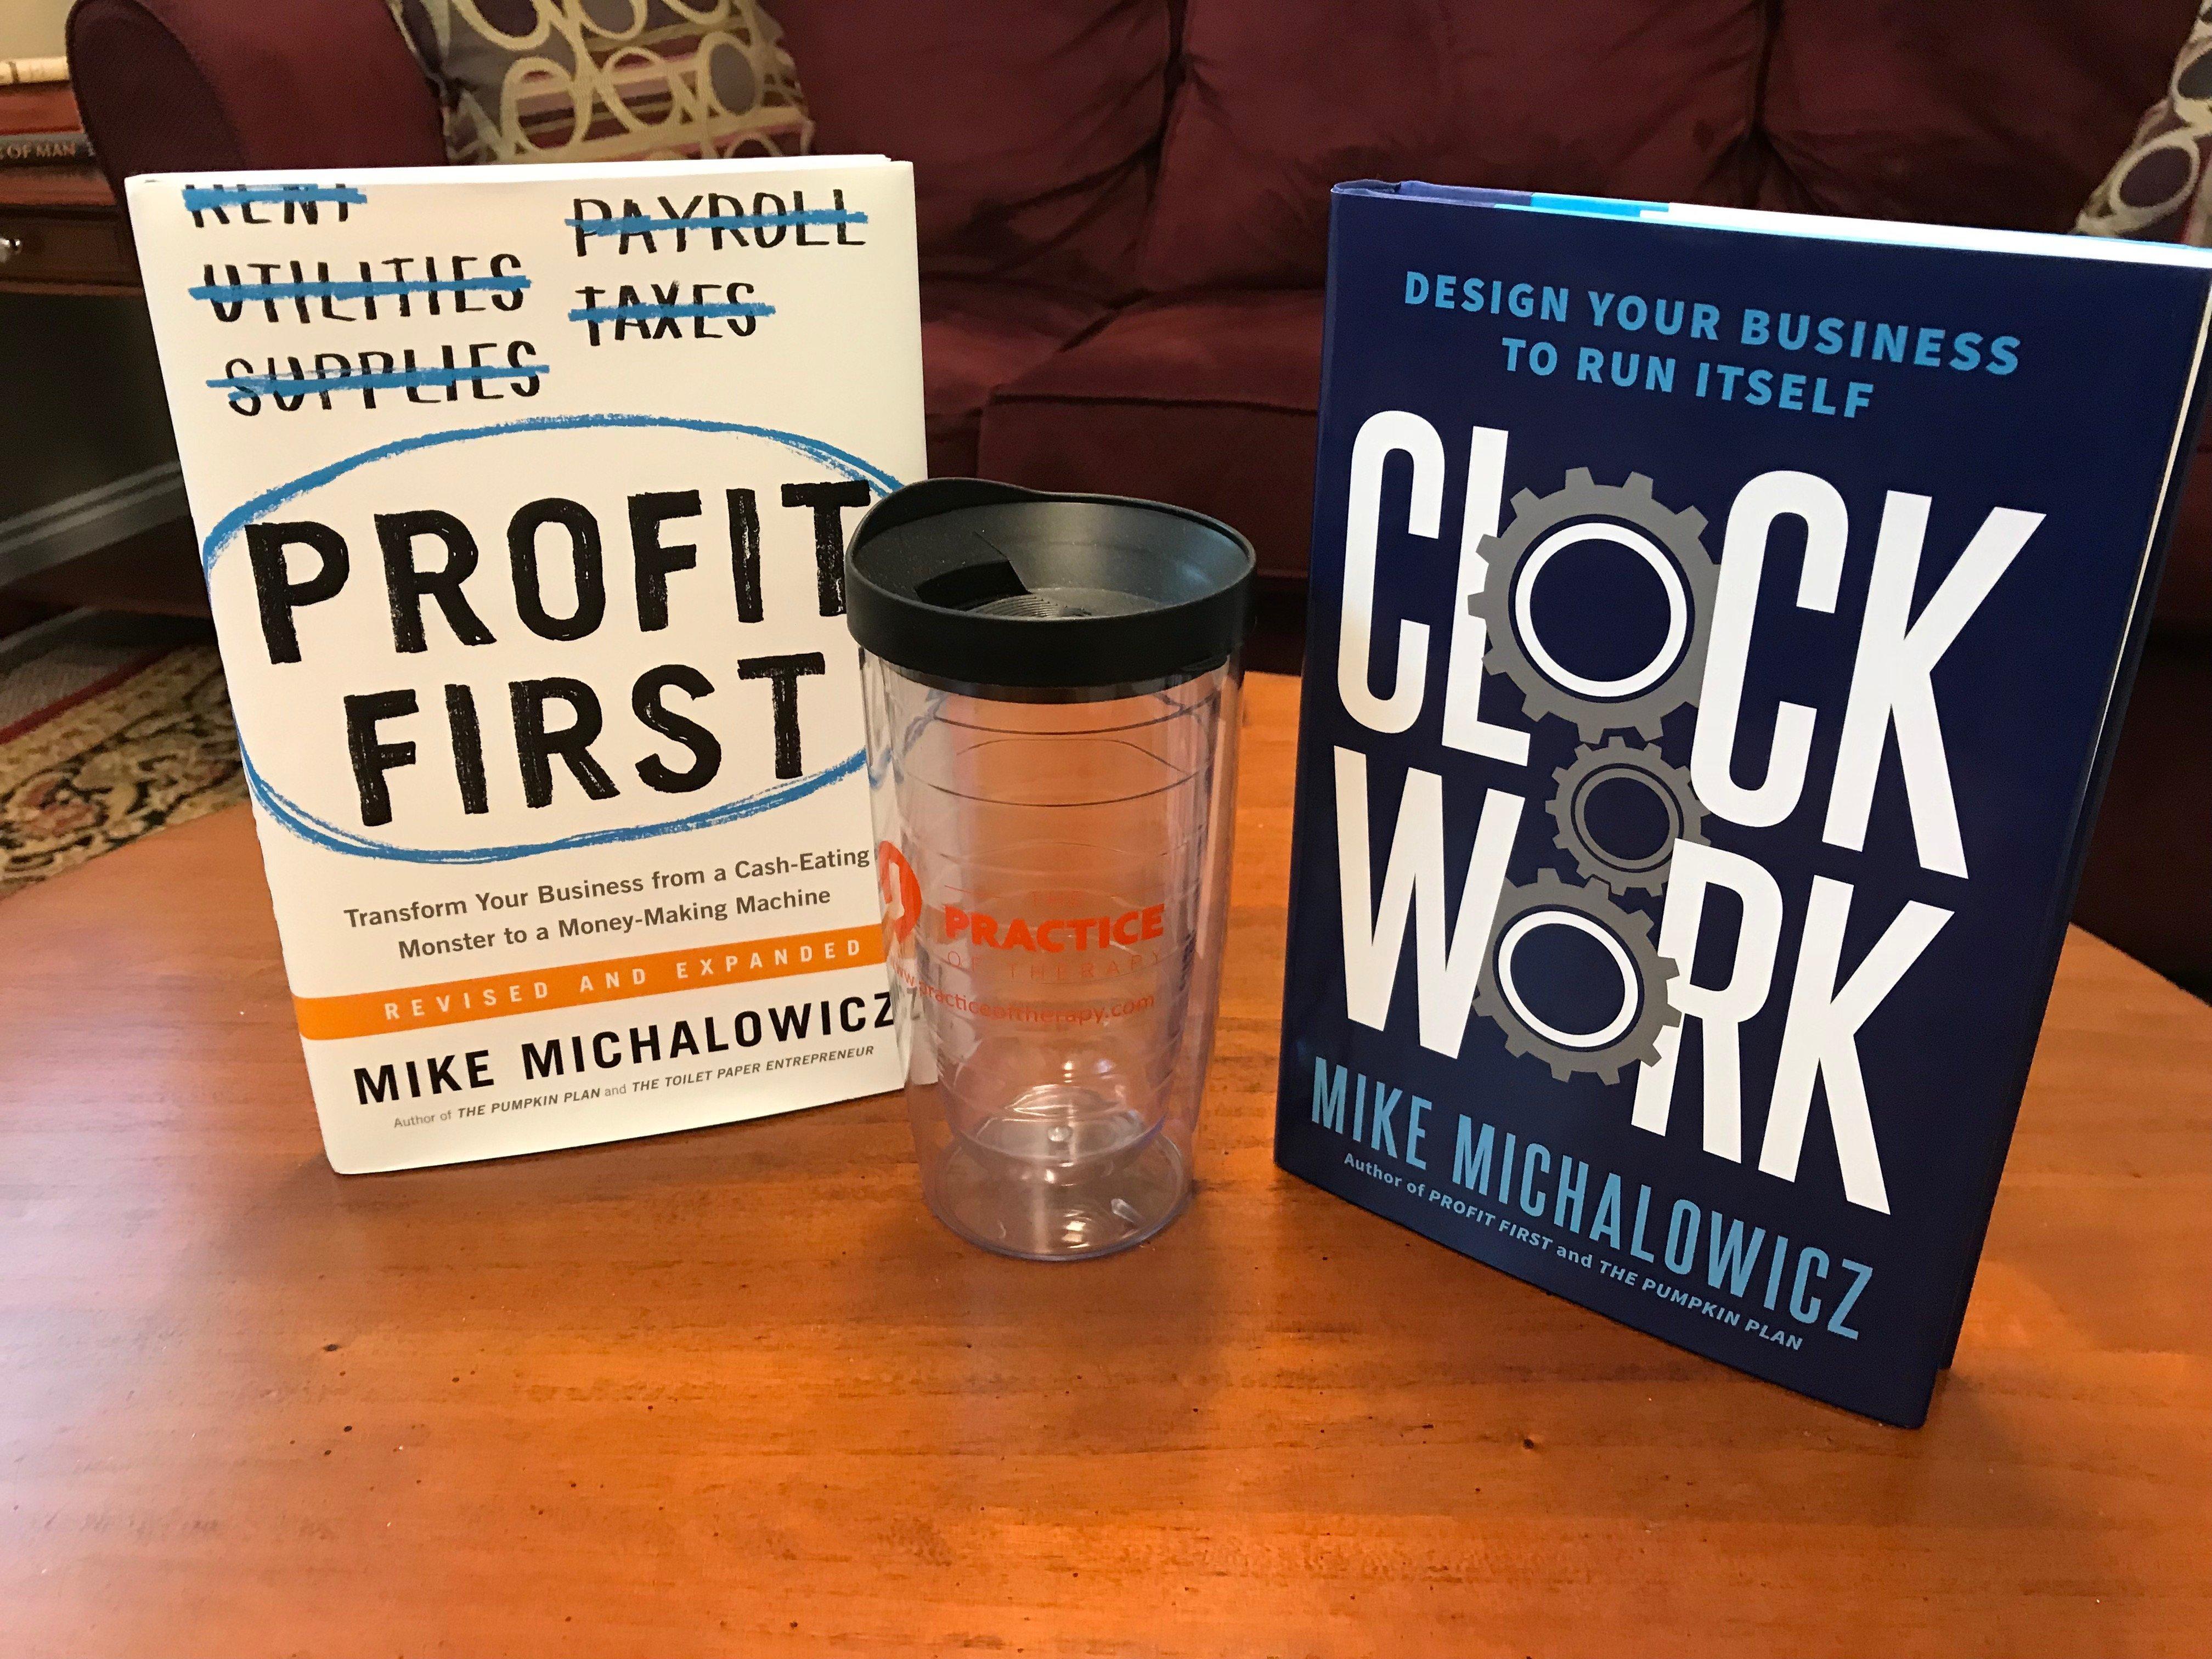 Profit First & Clockwork Giveaway